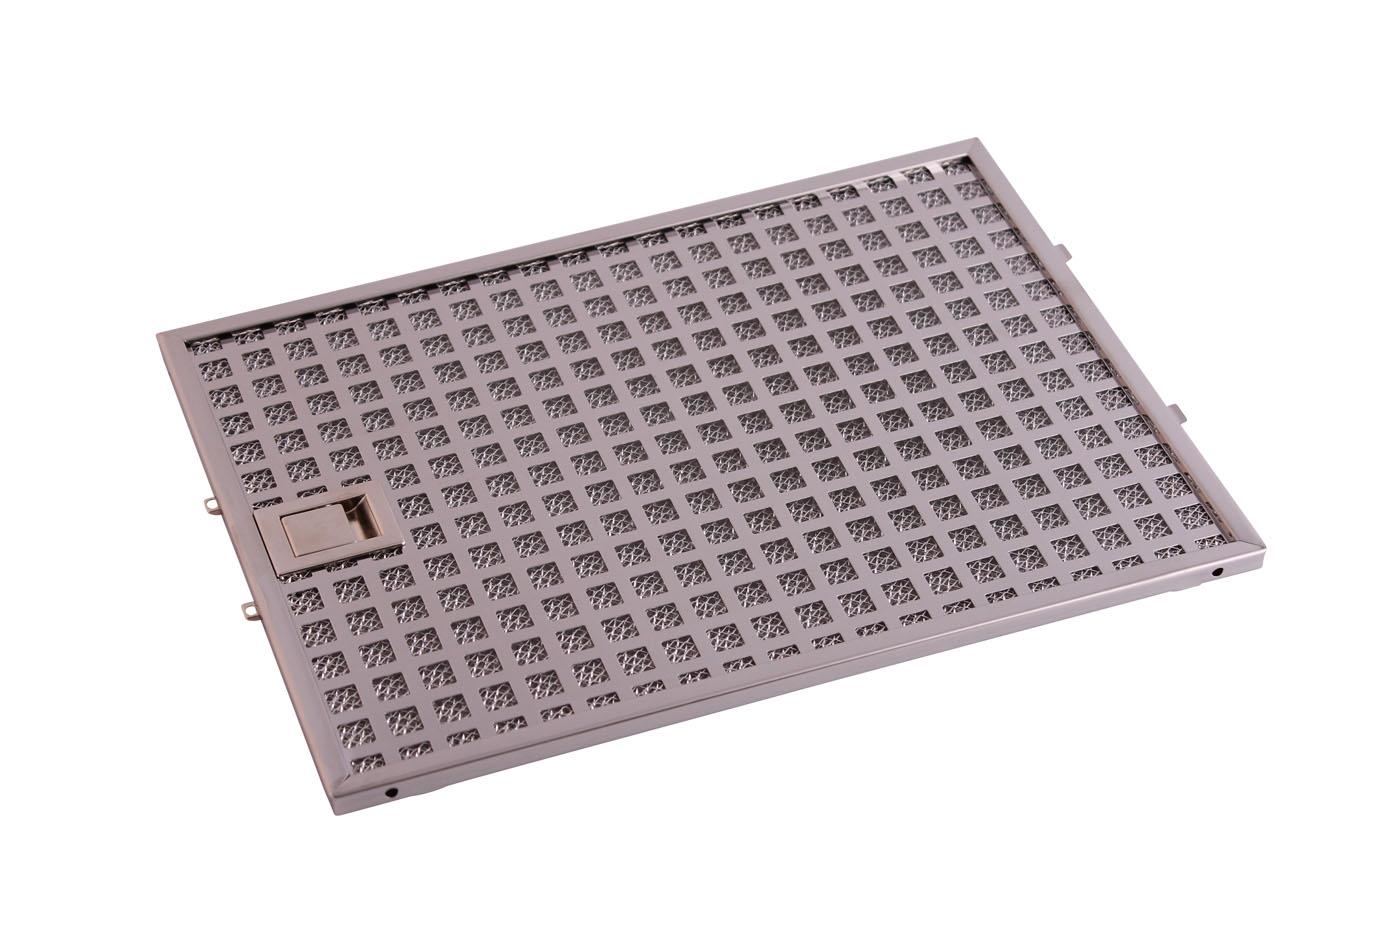 Novy aluminium filter 315 x 230 mm voor afzuigkap 506-8010